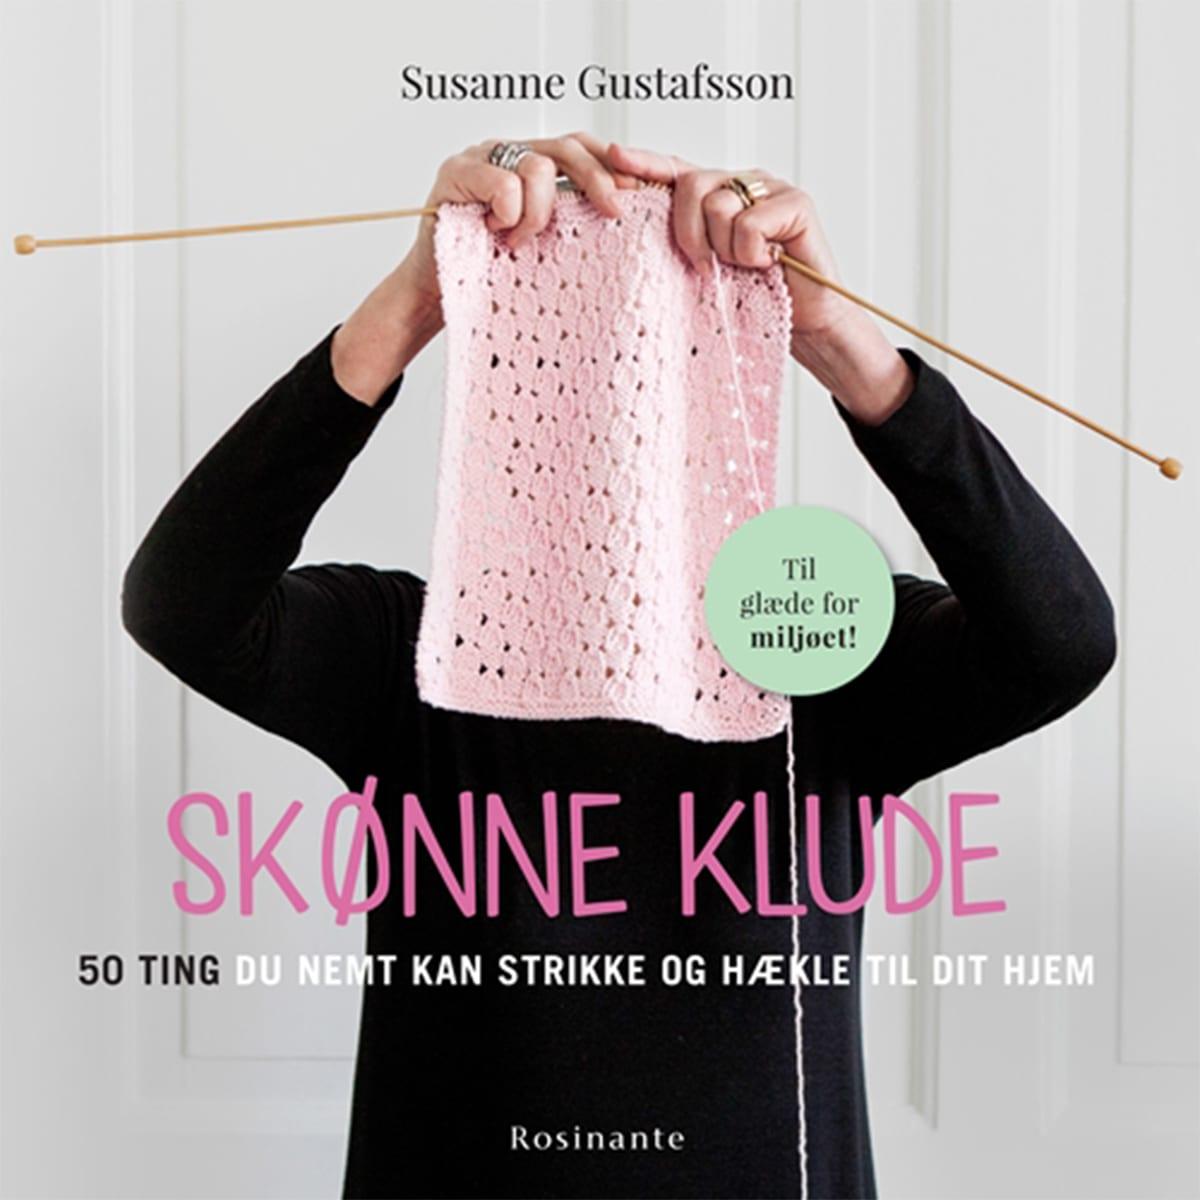 Af Susanne Gustafsson